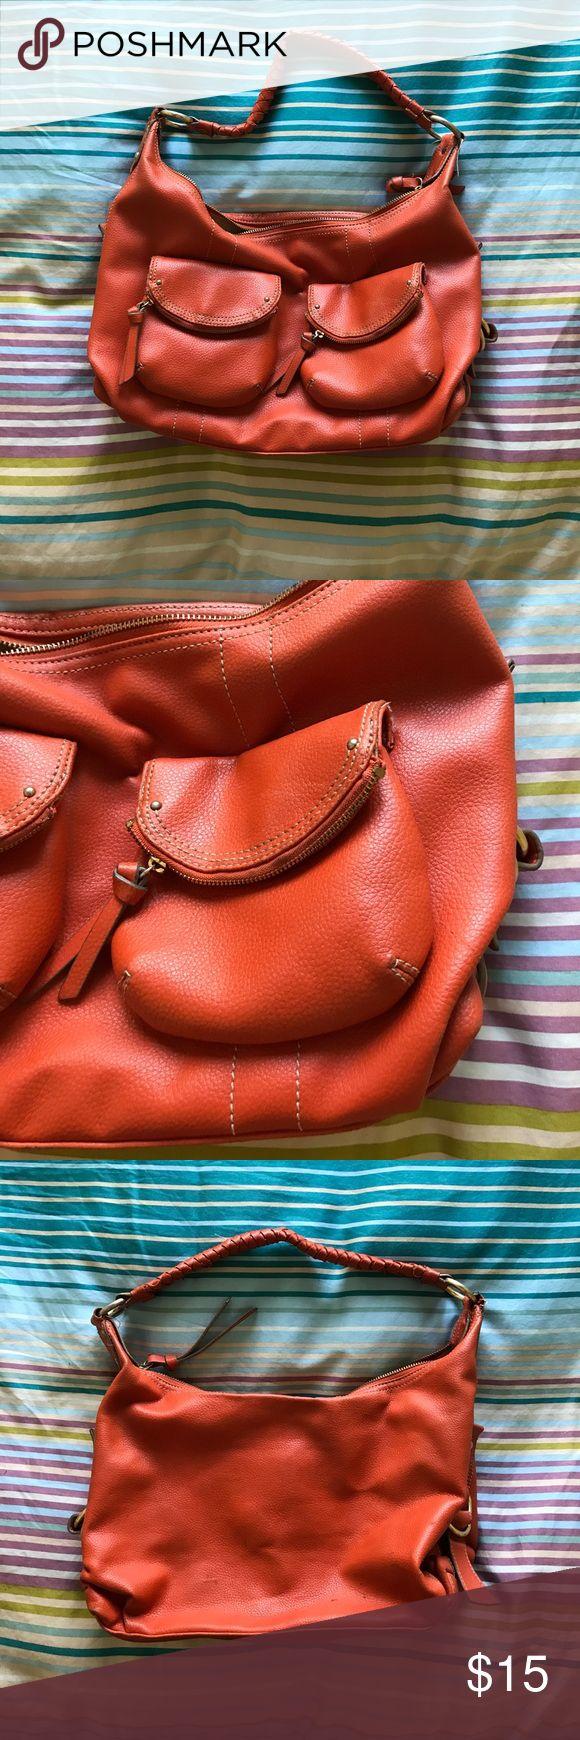 Nine West Orange Shoulder Bag Super cute purse. Very versatile and great for spring and summer. Lots of pockets Nine West Bags Shoulder Bags